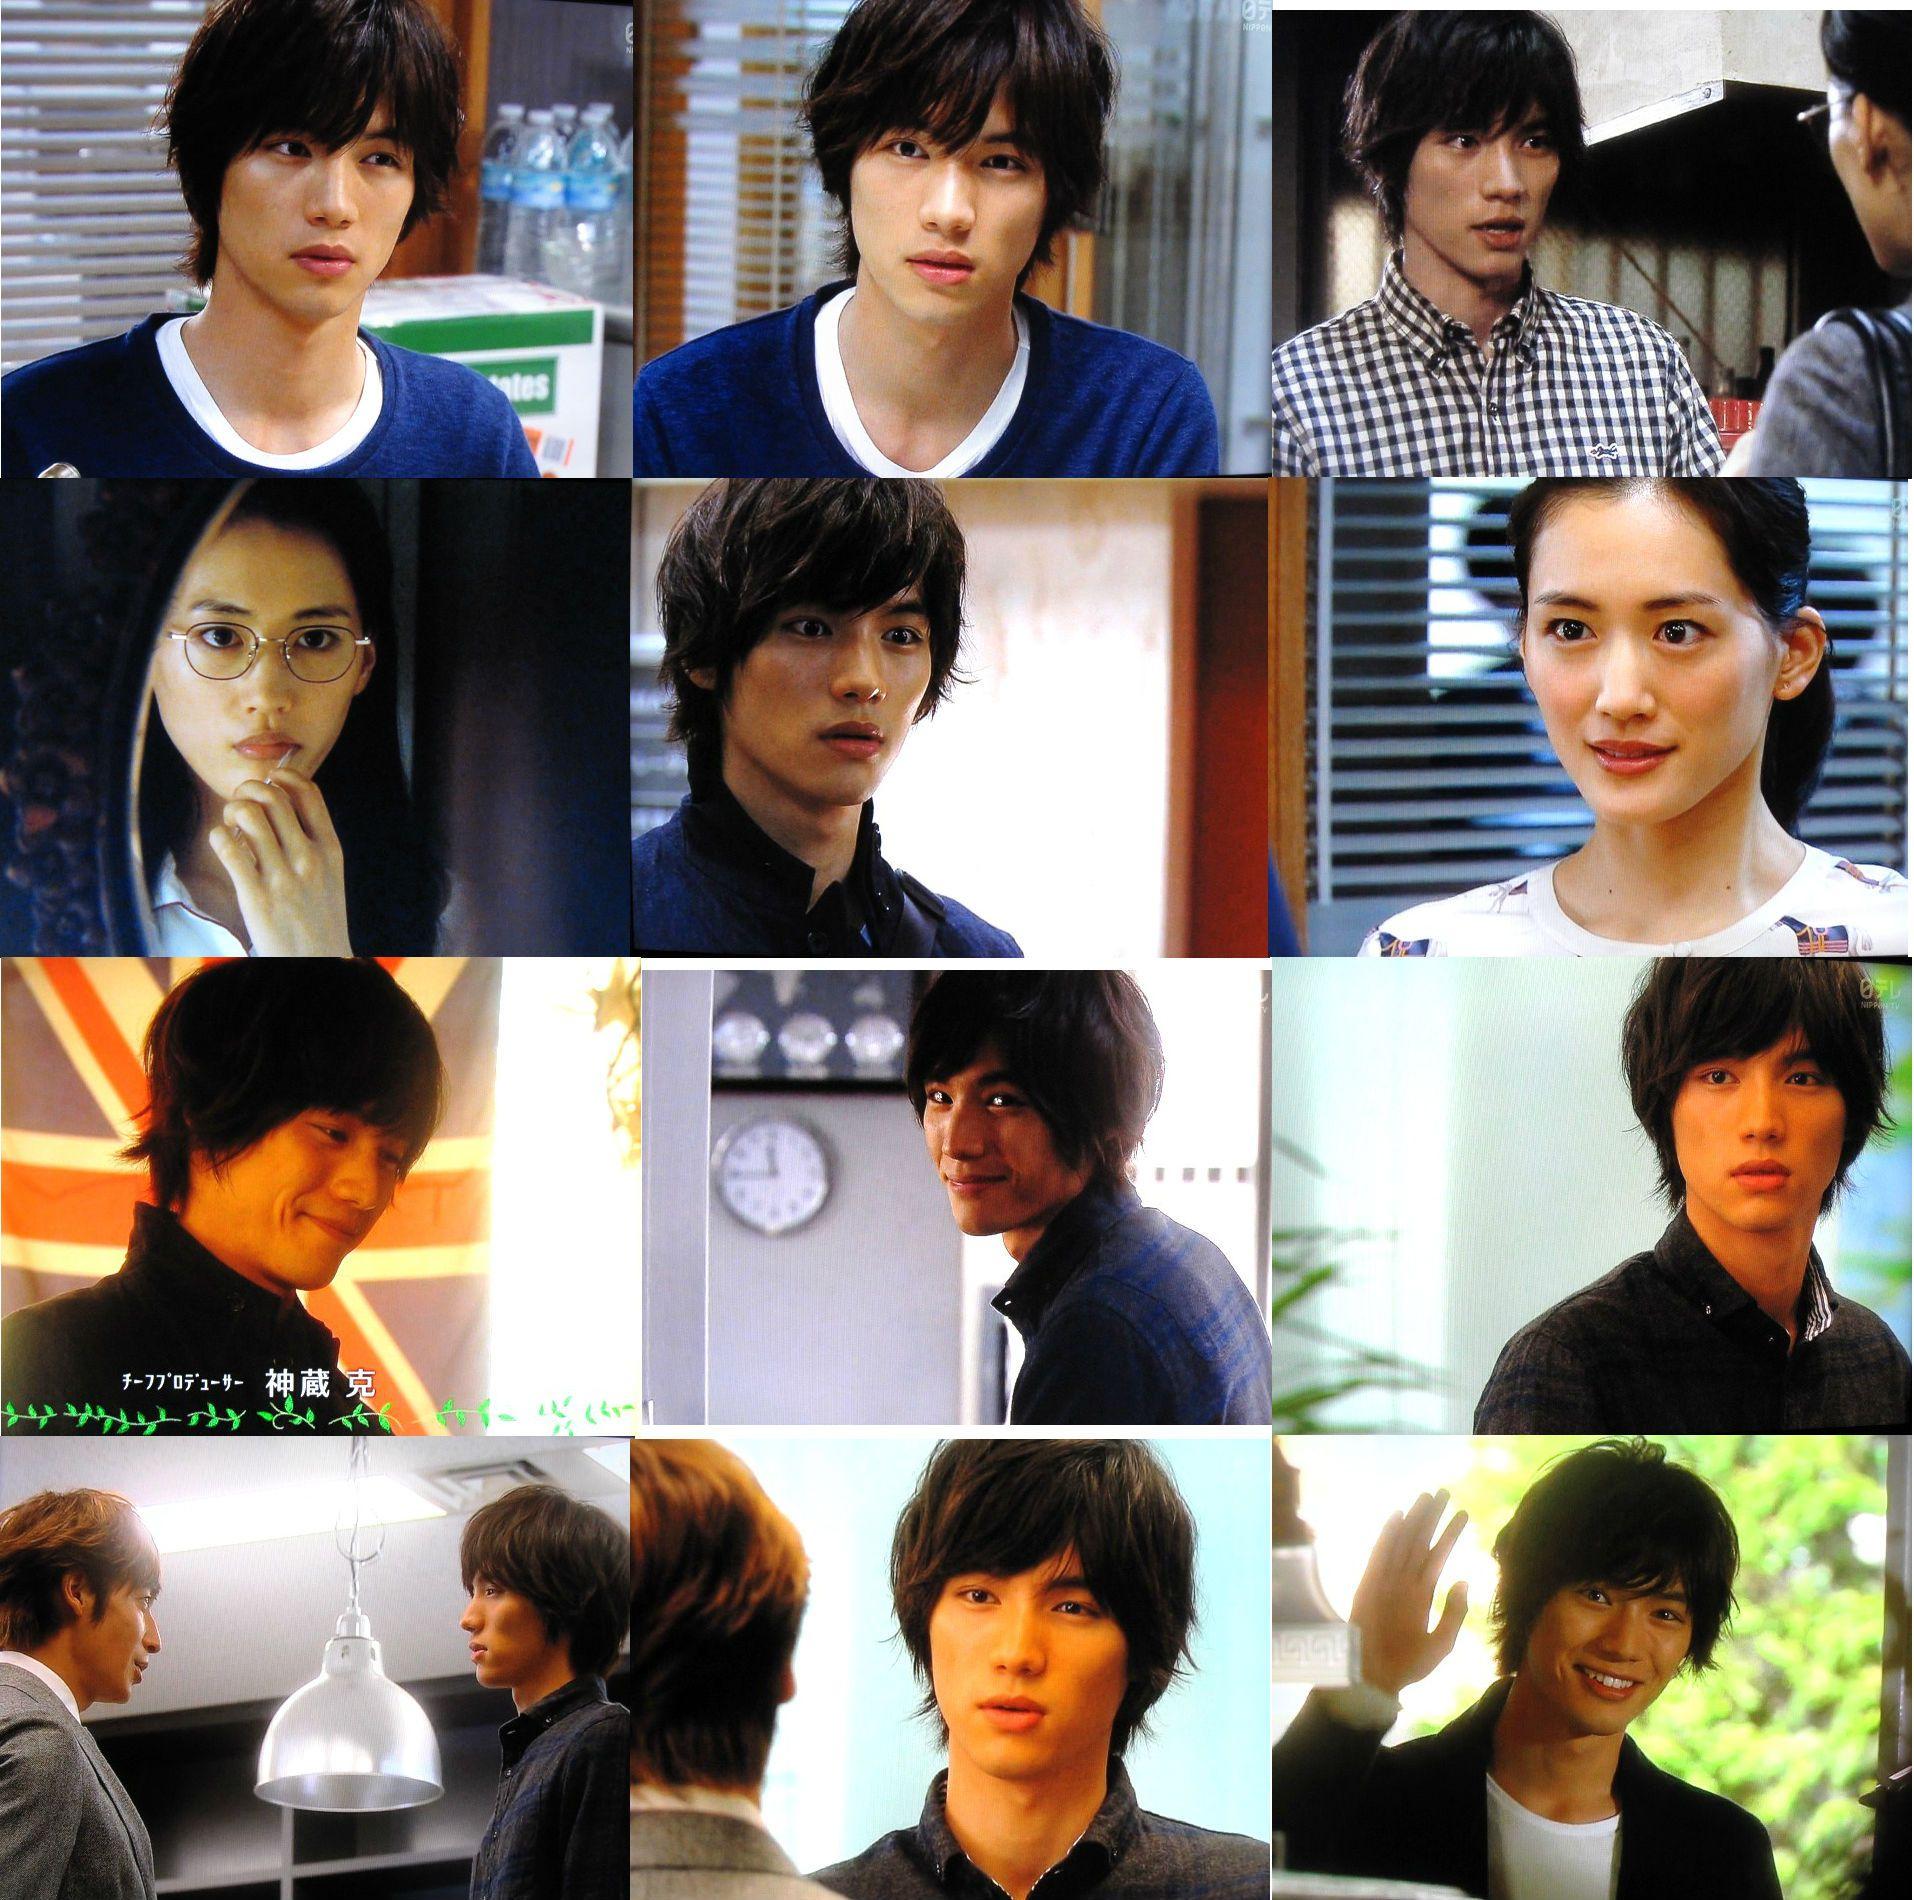 J Drama Ele scene: ep.2-3. haruka ayase, sota fukushi, hiroshi tamaki, yudai